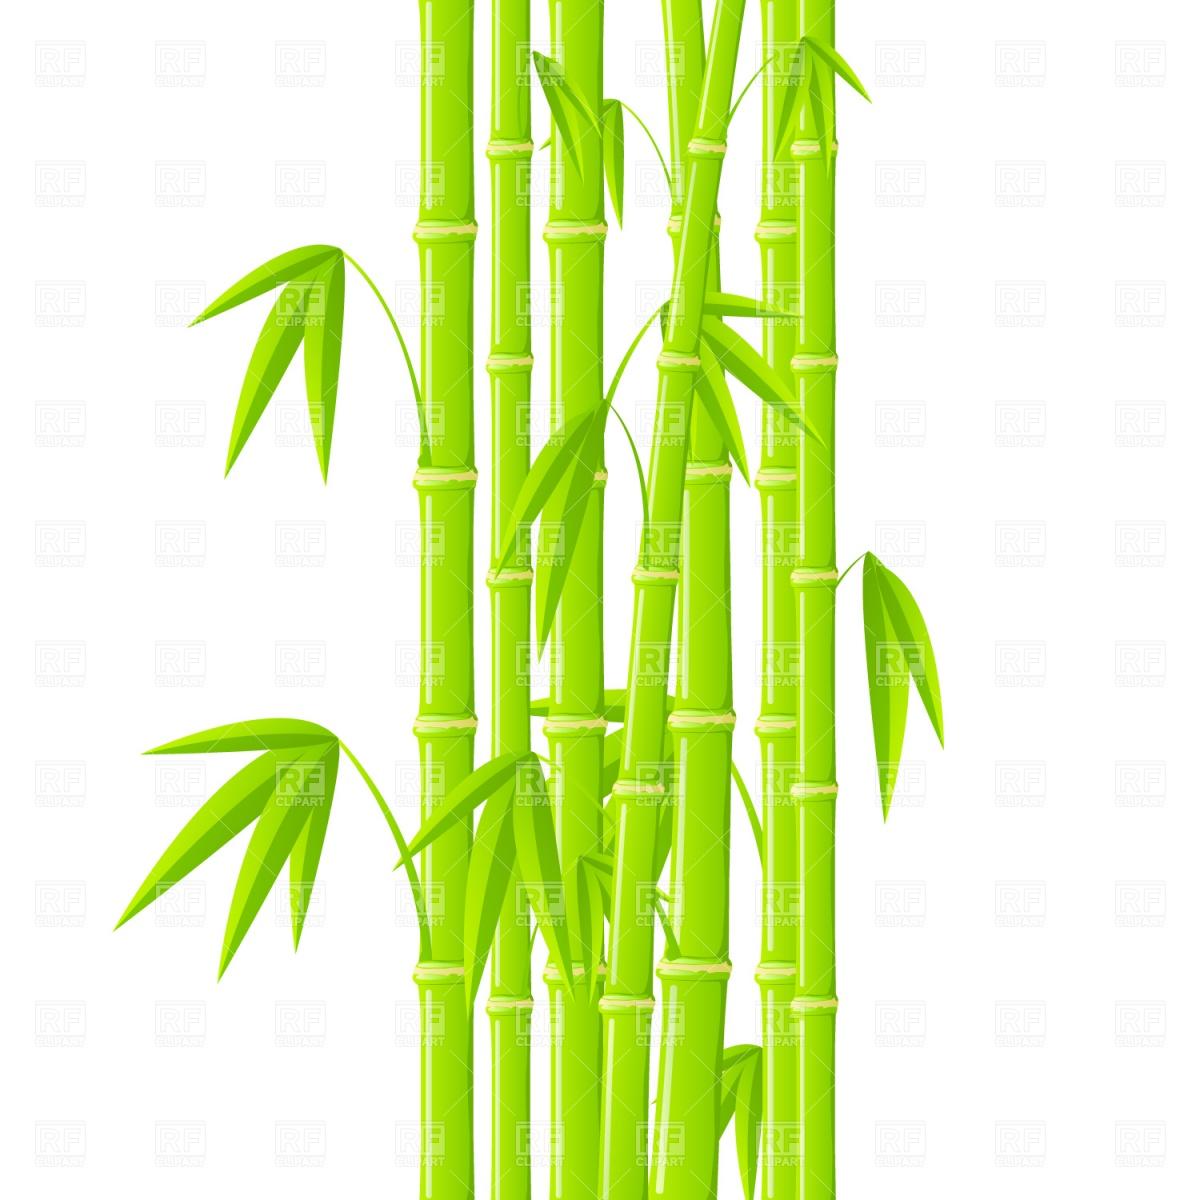 Bamboo sticks clip art cliparts